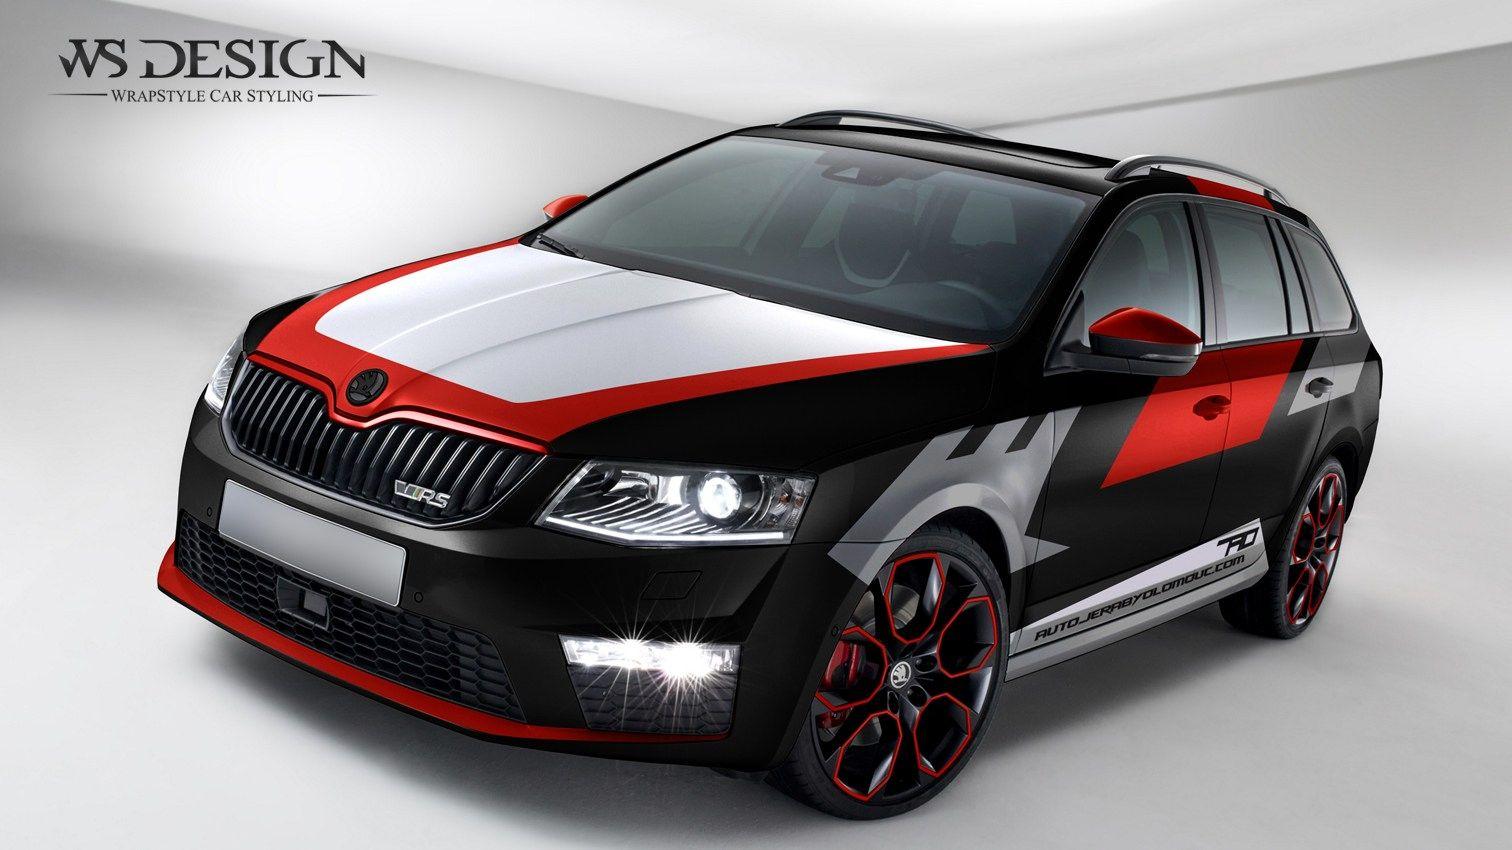 1 skoda octavia rs combi 1512 850 2016 car wraps pinterest autofolierung. Black Bedroom Furniture Sets. Home Design Ideas